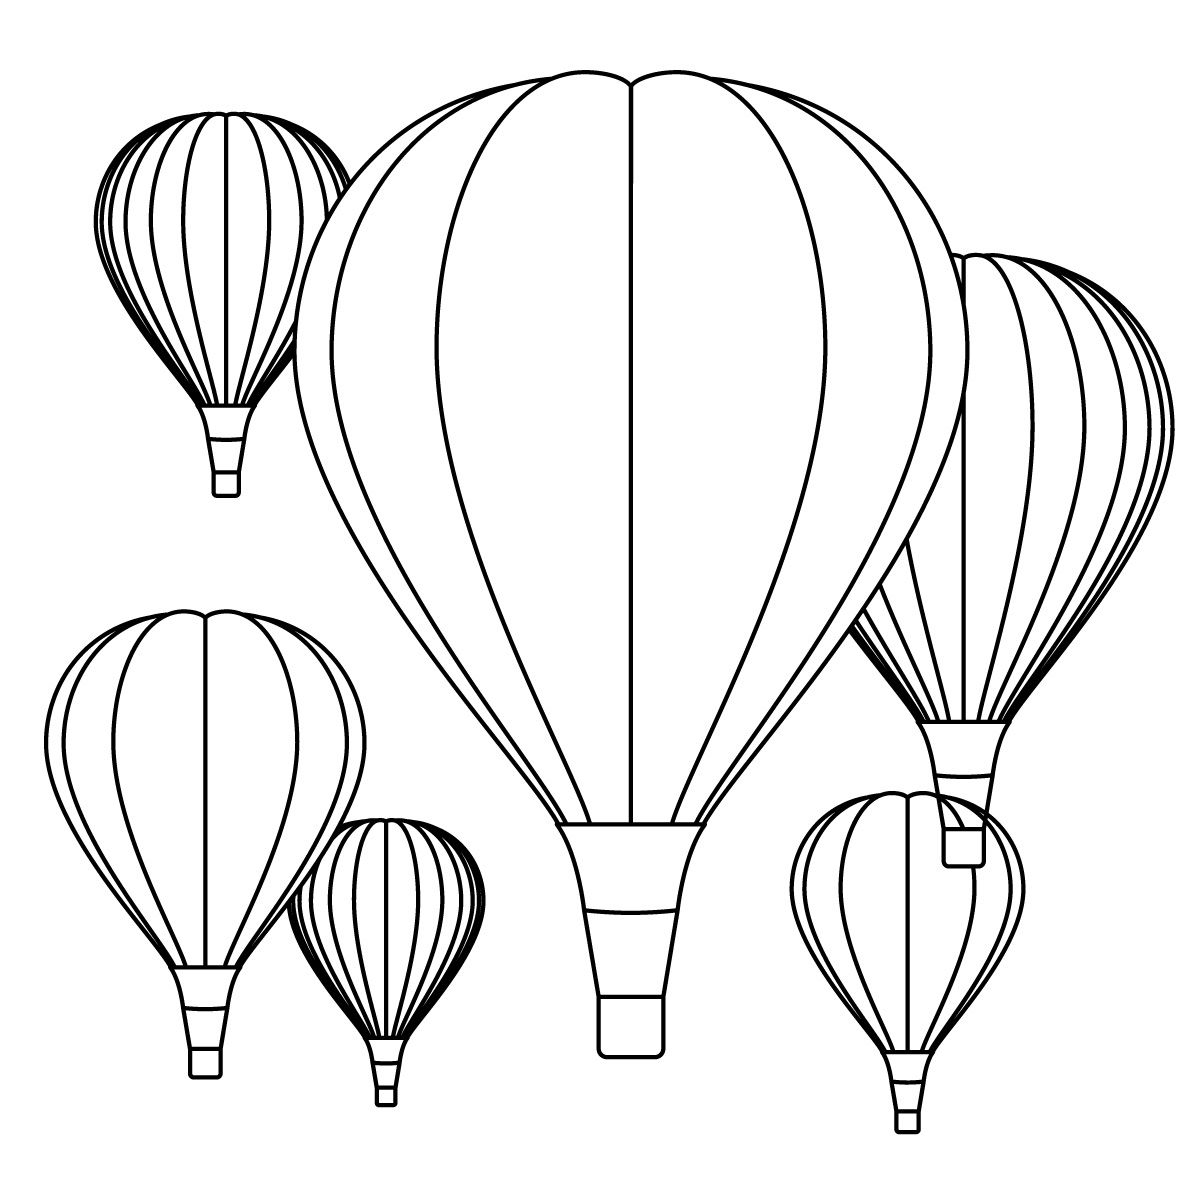 25 Hot Air Balloon Clip Art Hotairballoonclipart5  Best Clip